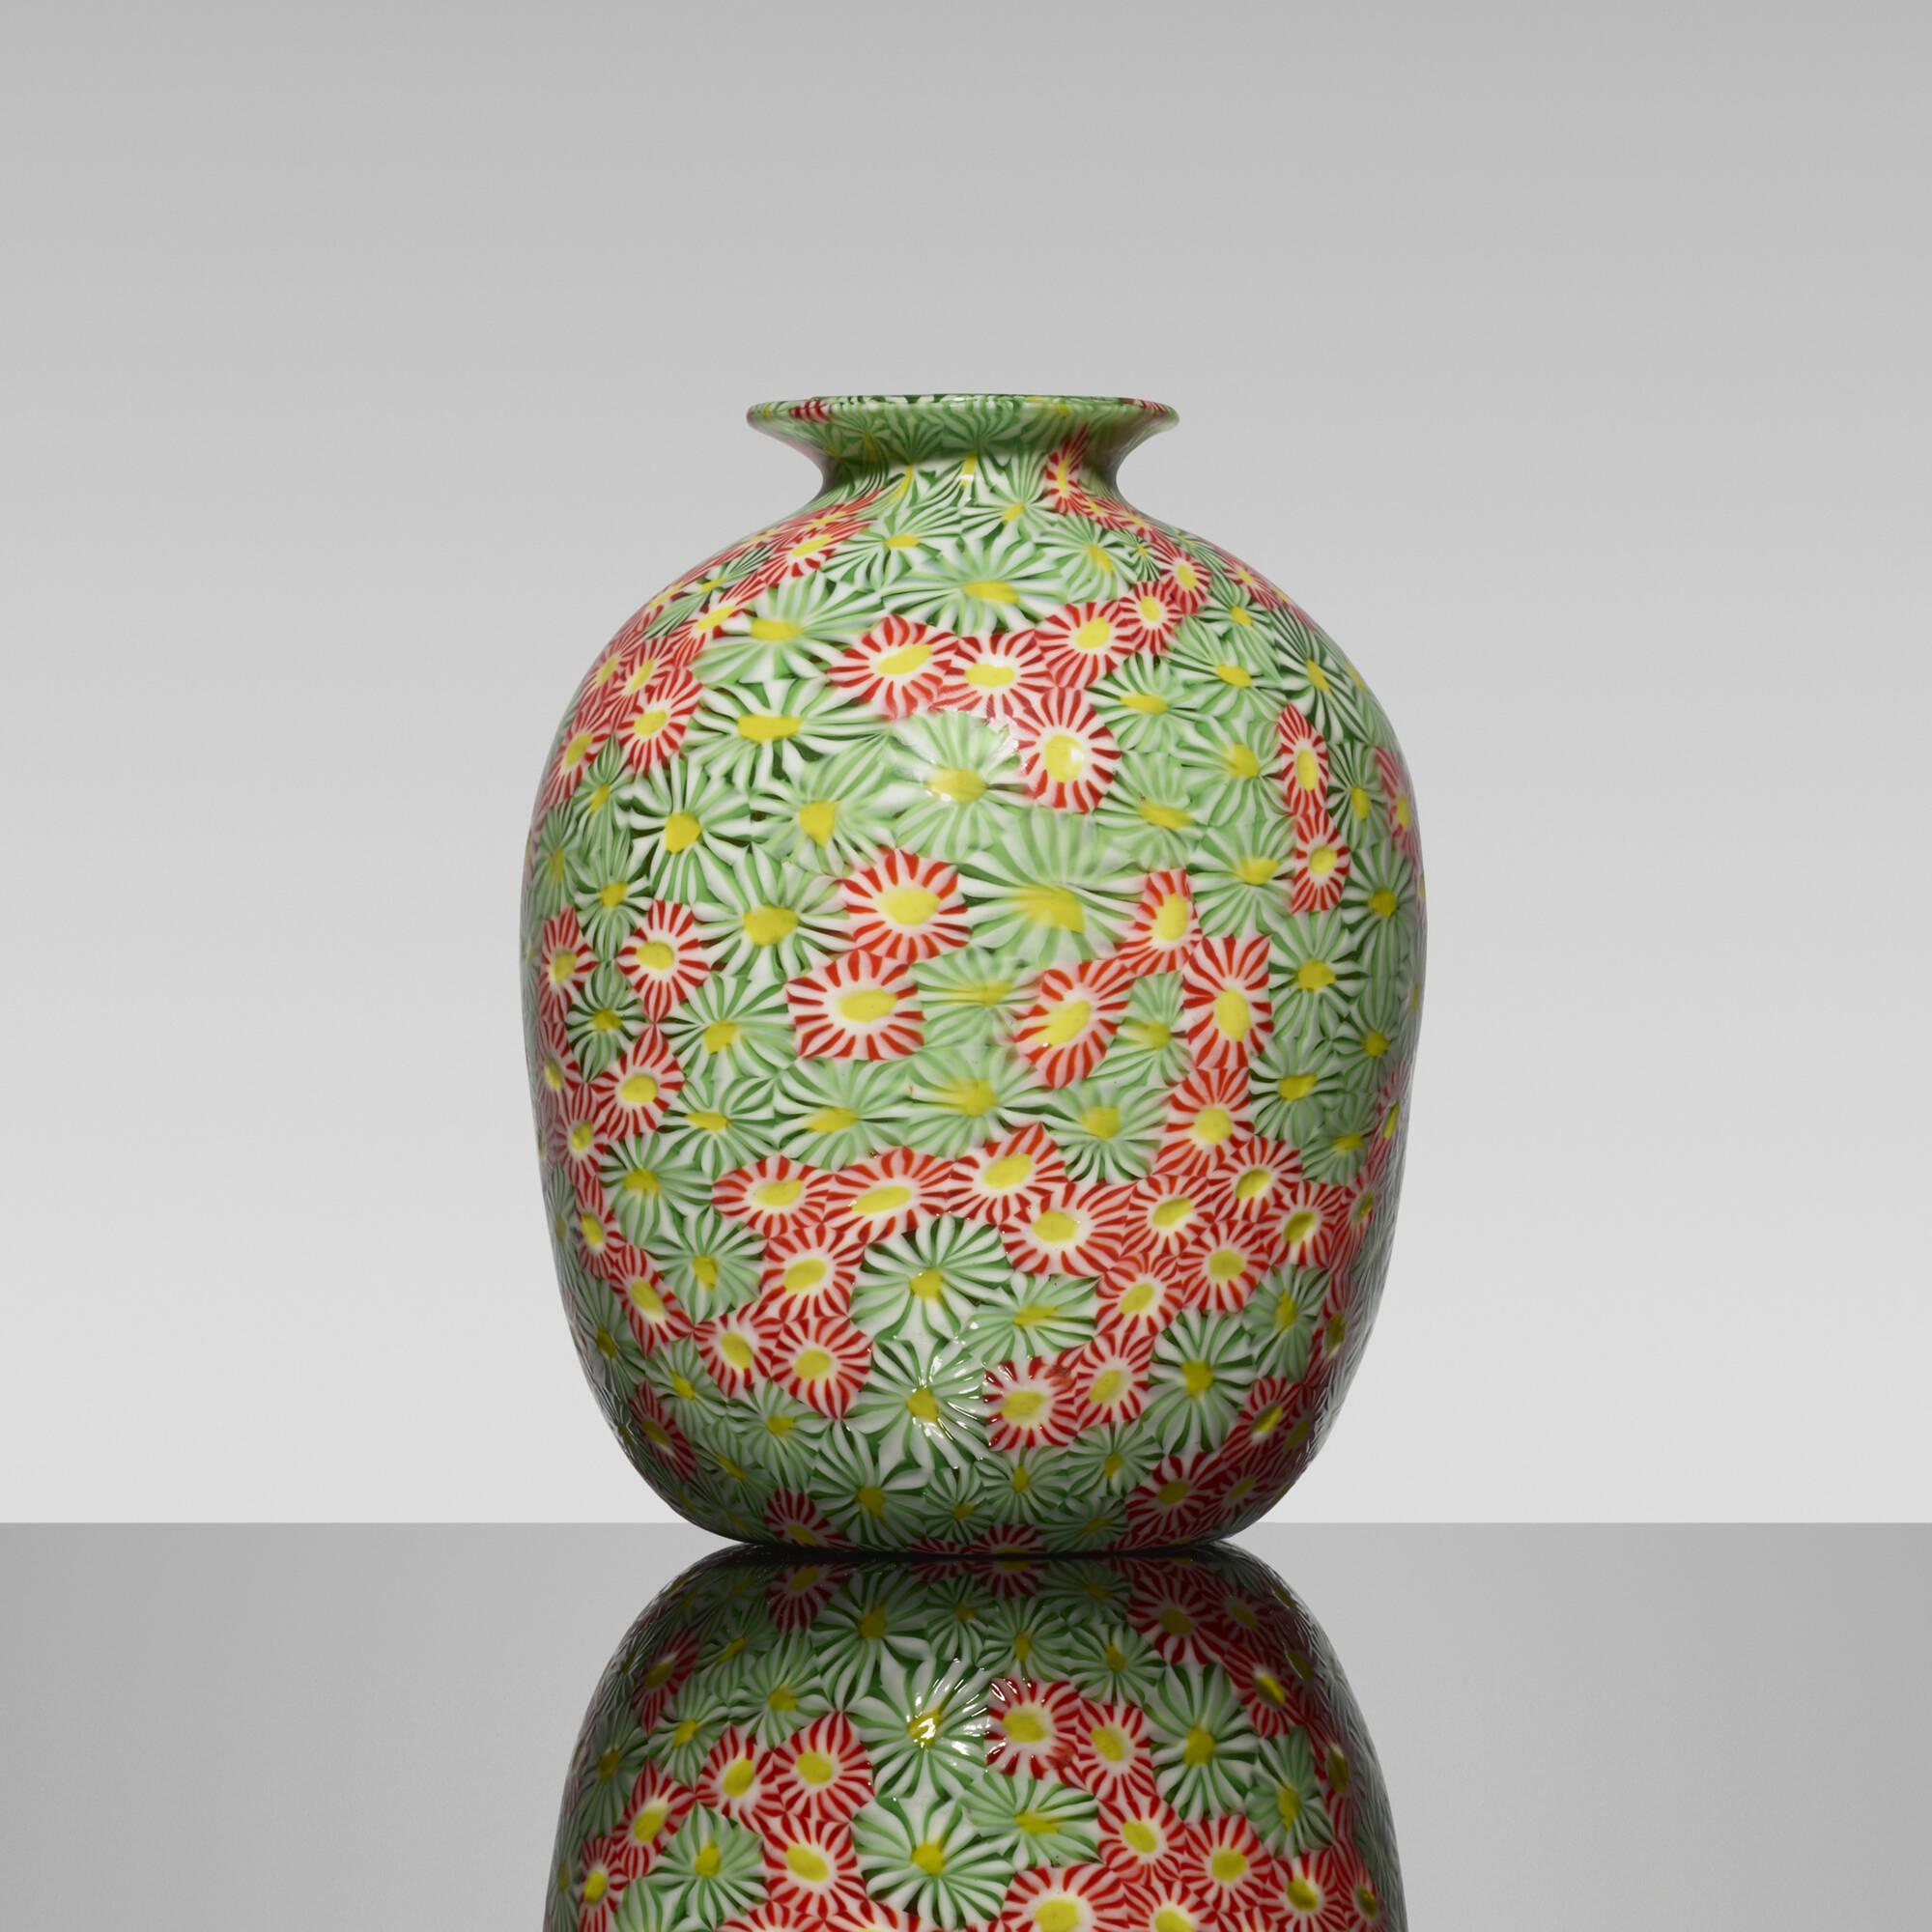 179: Fratelli Toso / Kiku vase (1 of 1)